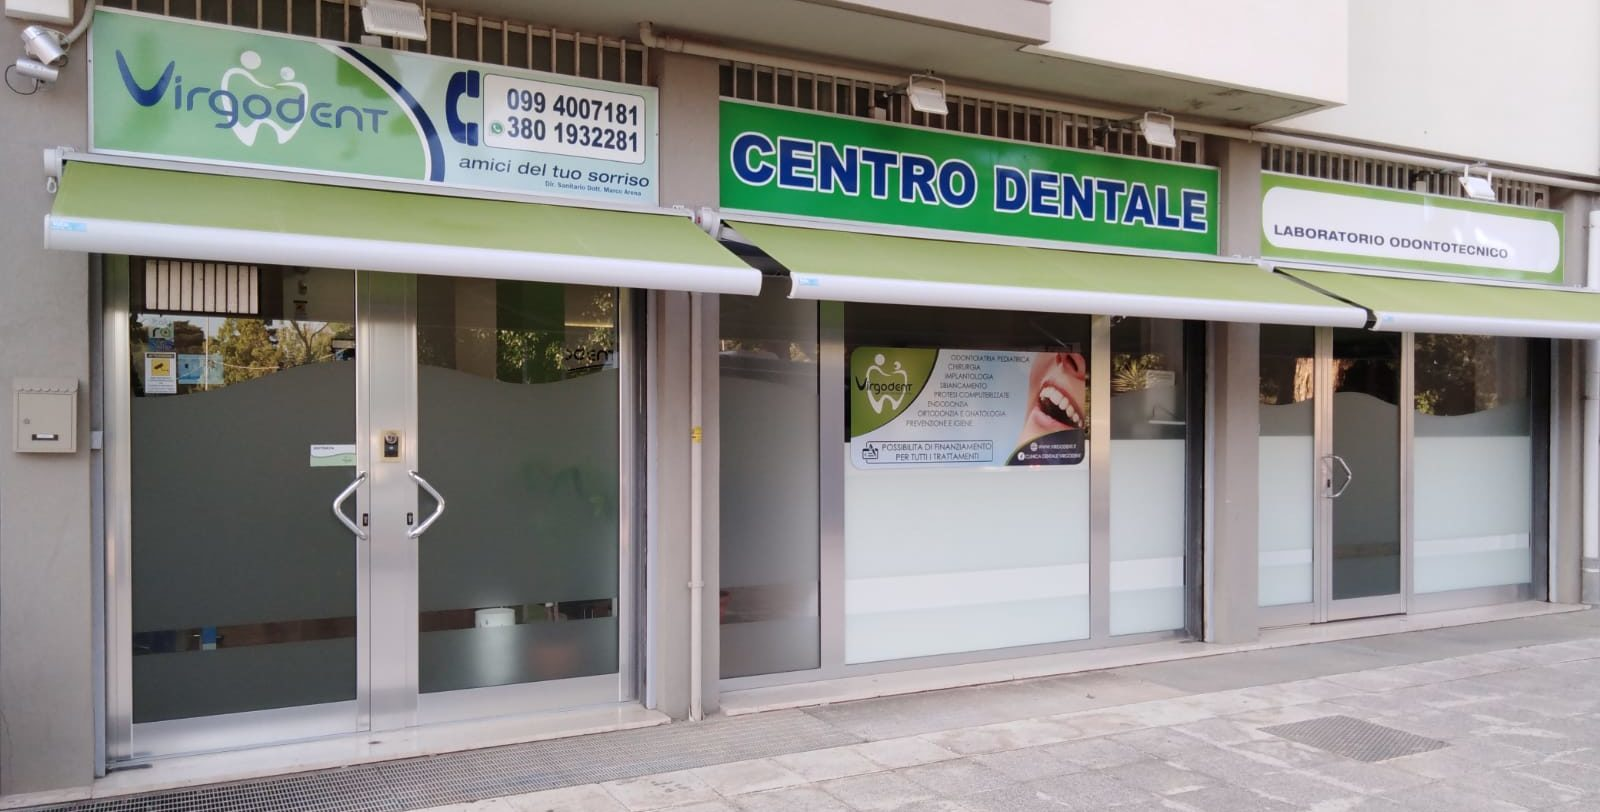 centro dentale virgodent